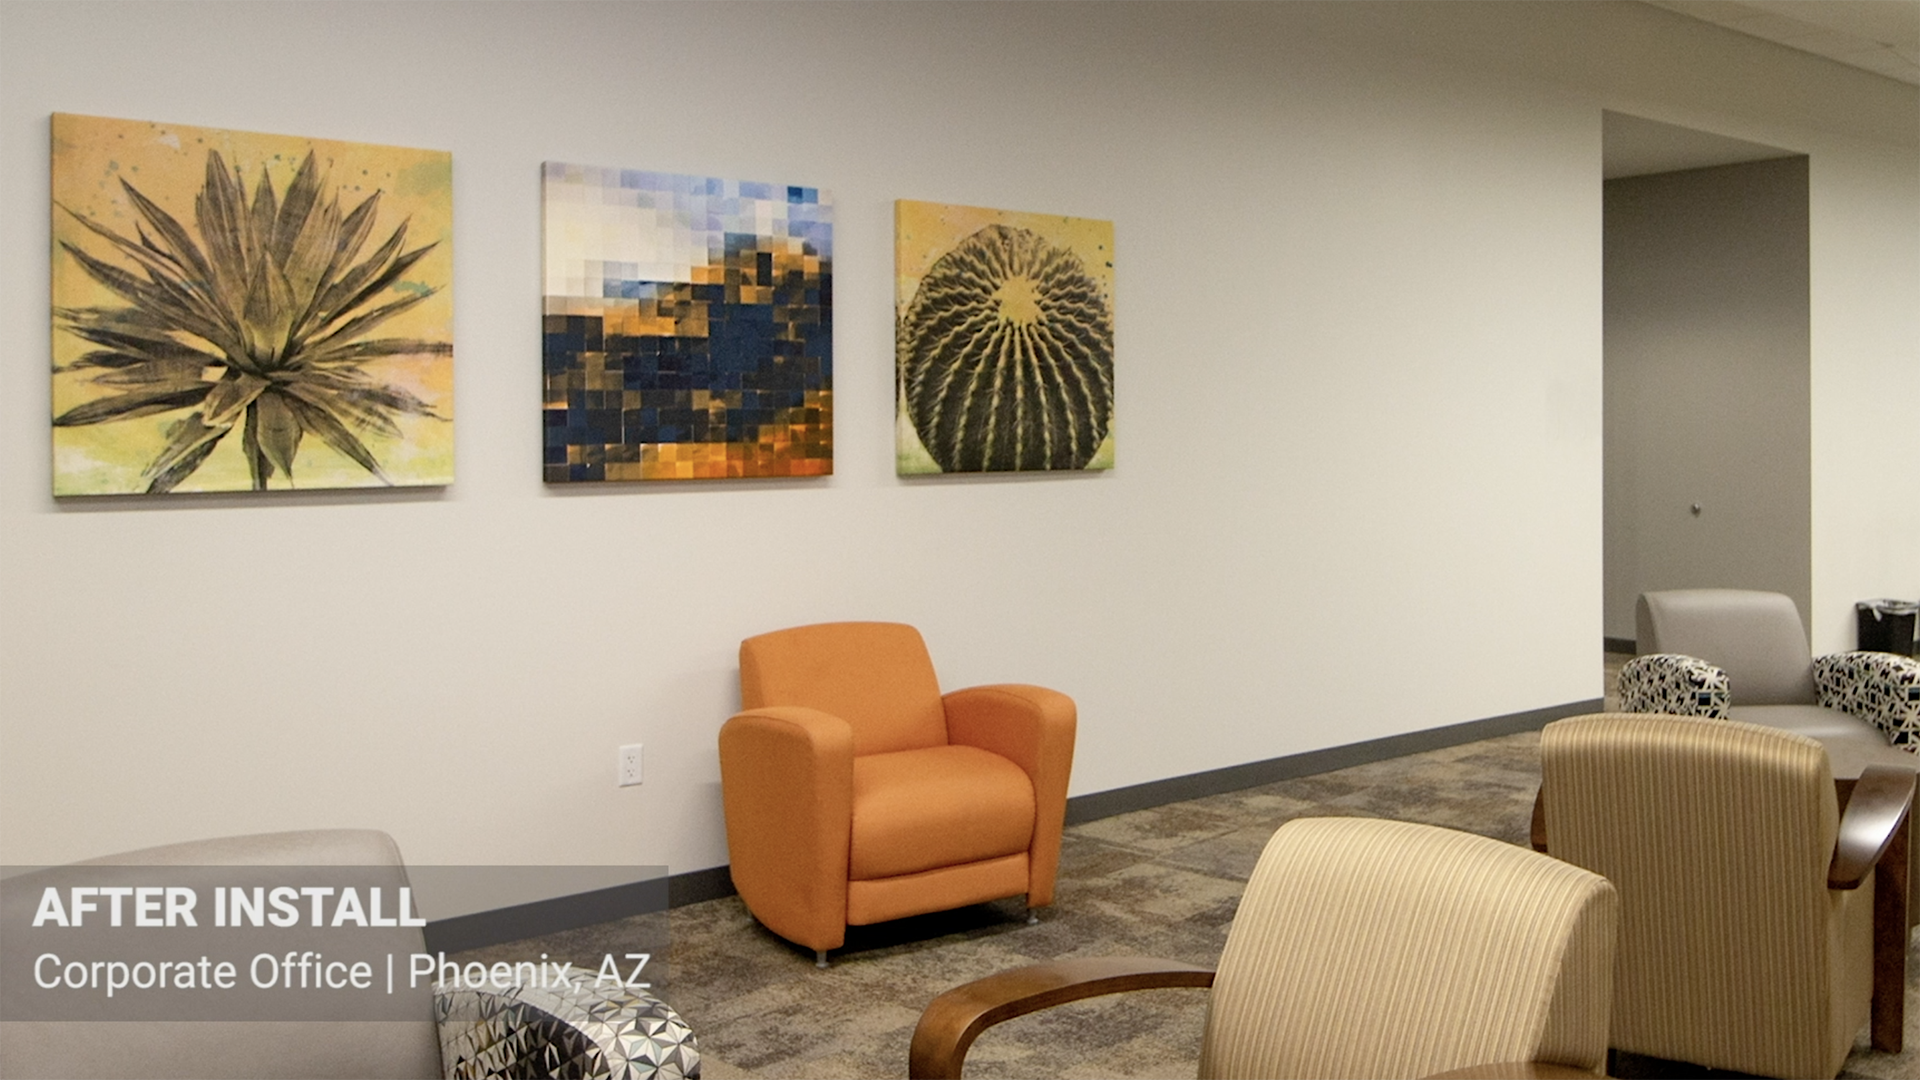 ARCH-Design-Timelapse-Art-Installation-Corporate